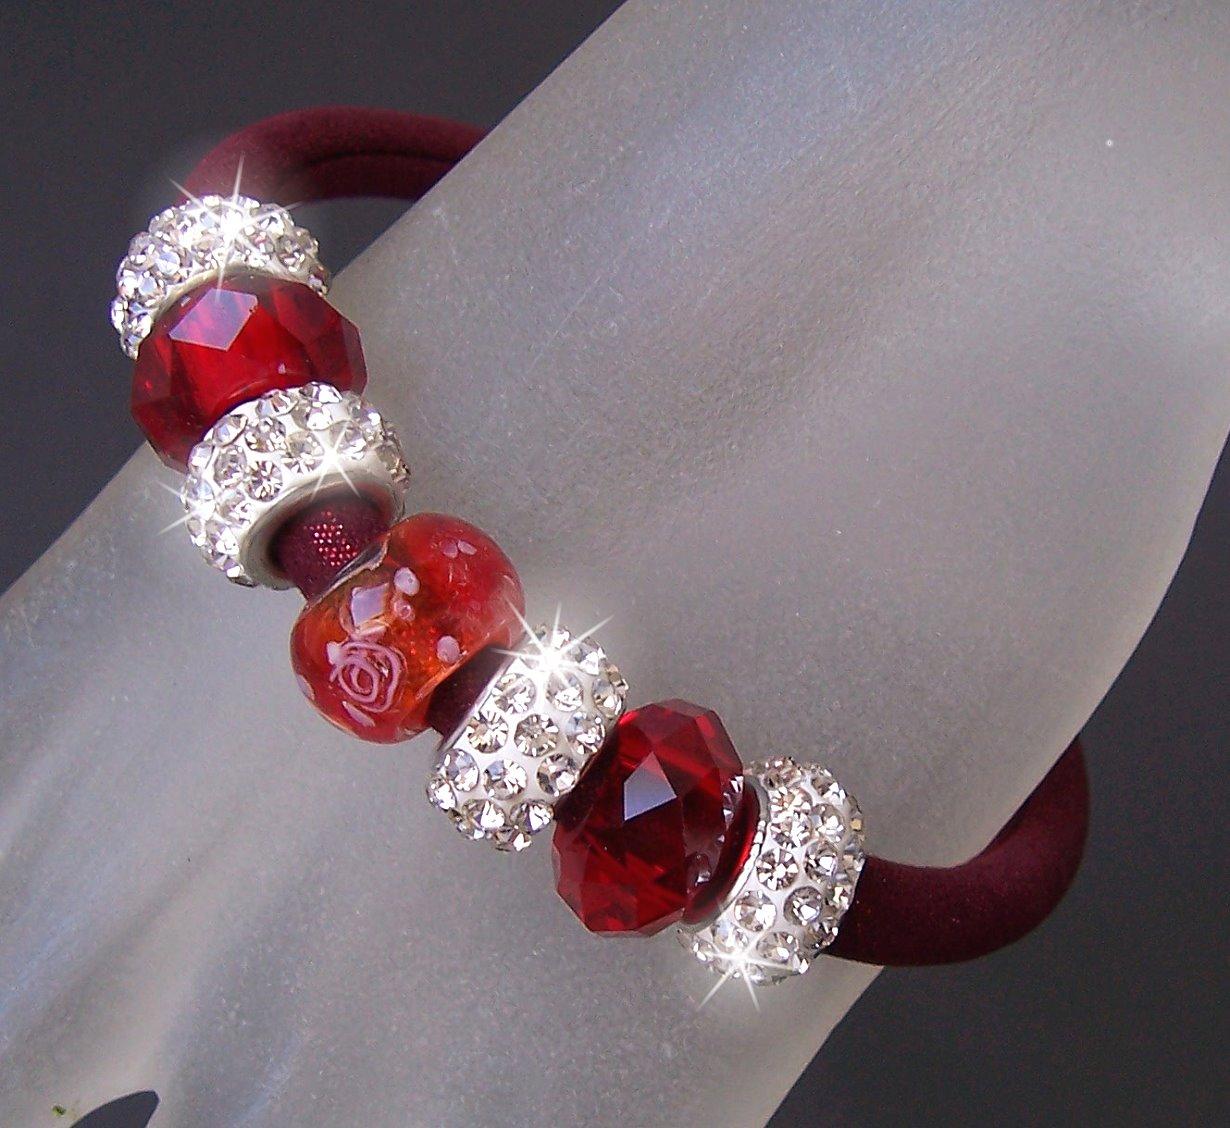 A715# Armband Satin Glitzerstoff dunkelrot Shamballa Perlen neu